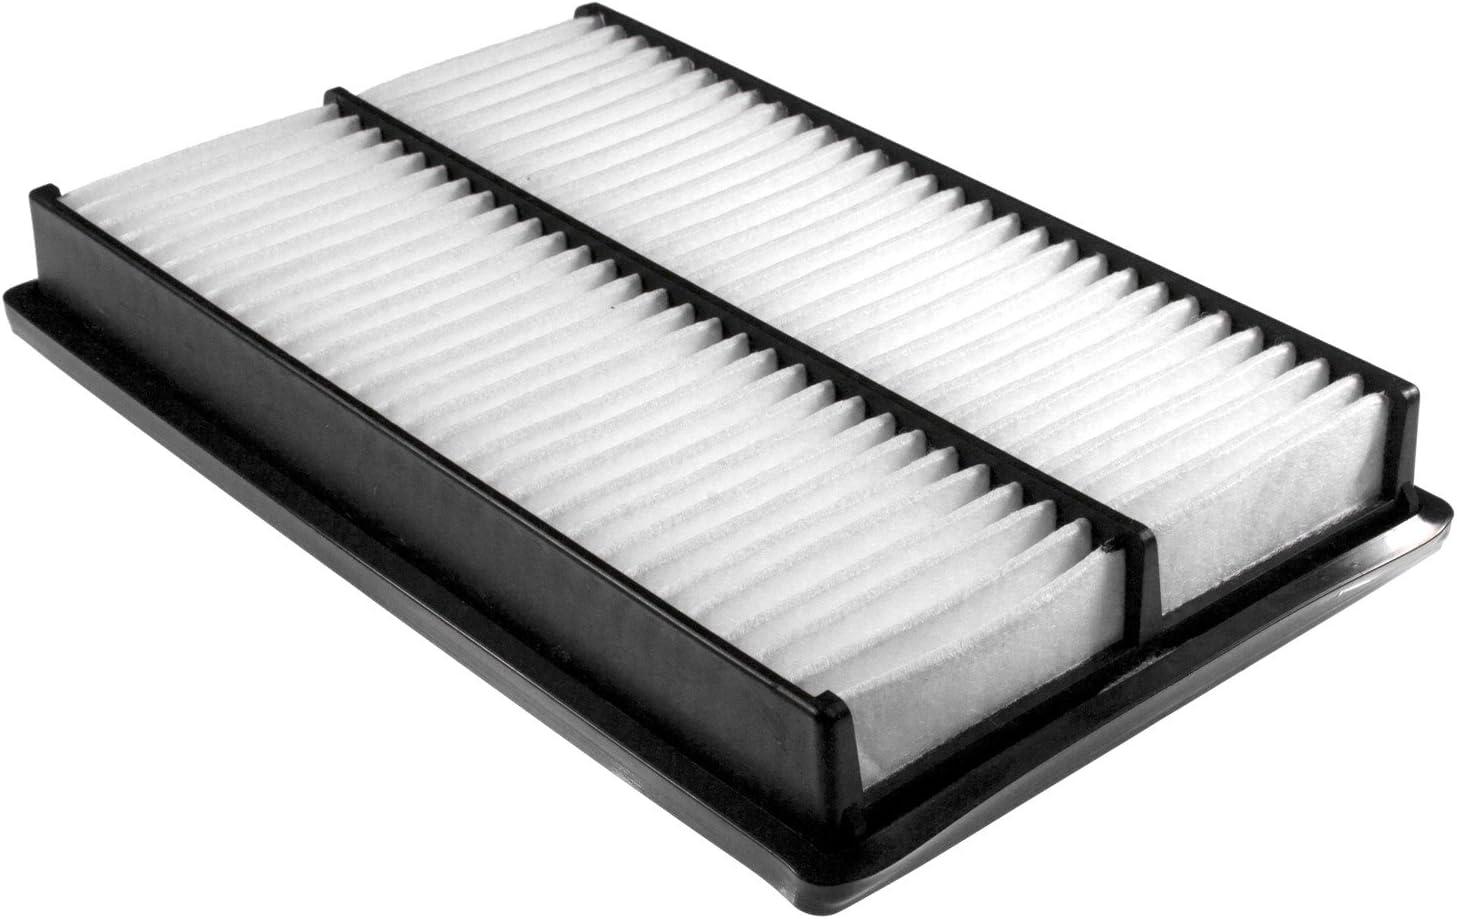 MAHLE Original LX 3067 Air Filter